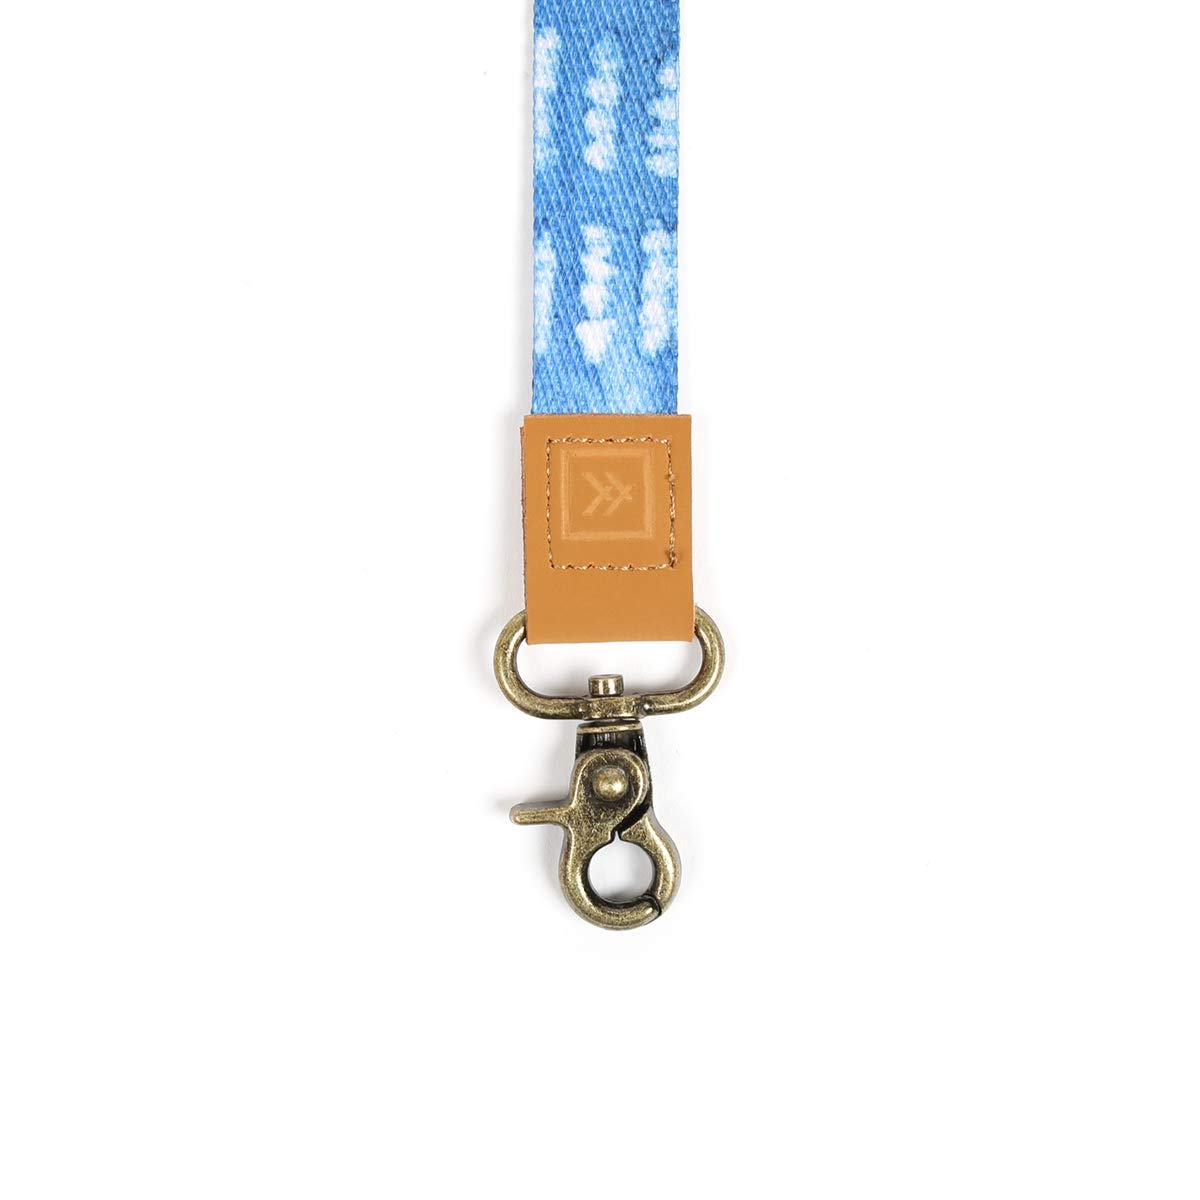 Thread Wallets - Cool Lanyards - Key Chain Holder (Wash)